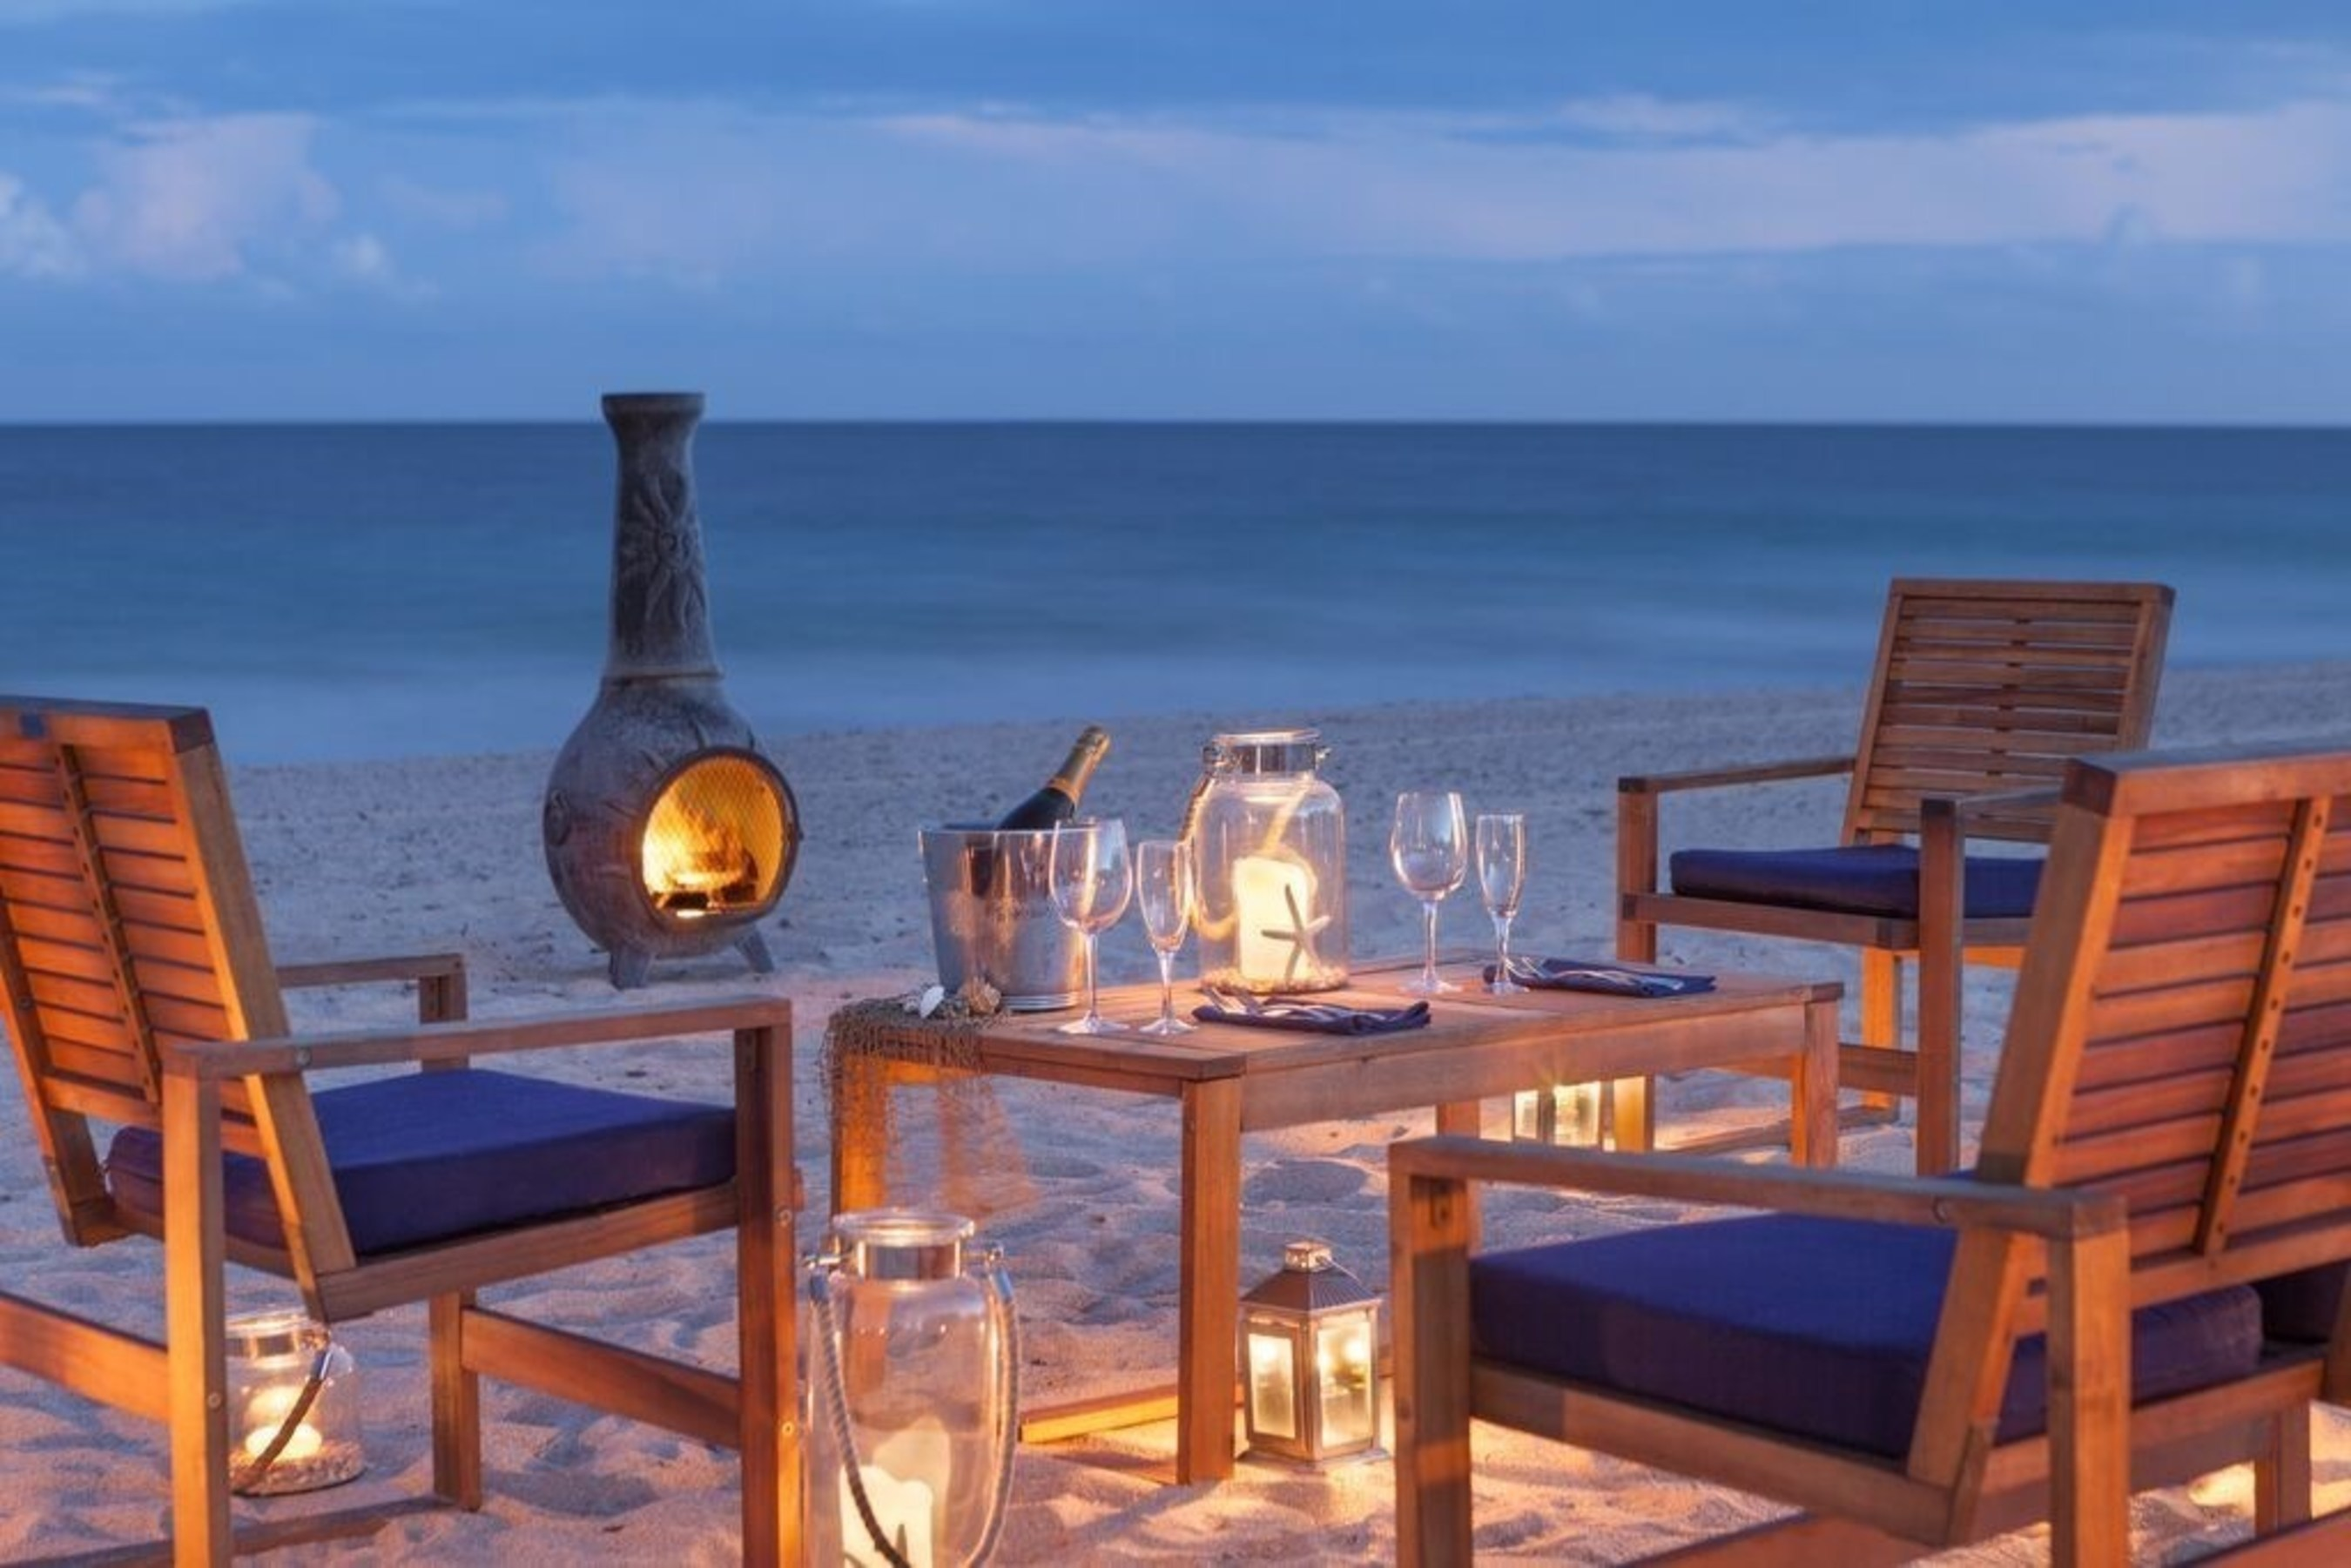 Fort Lauderdale Marriott Harbor Beach Resort & Spa Offers